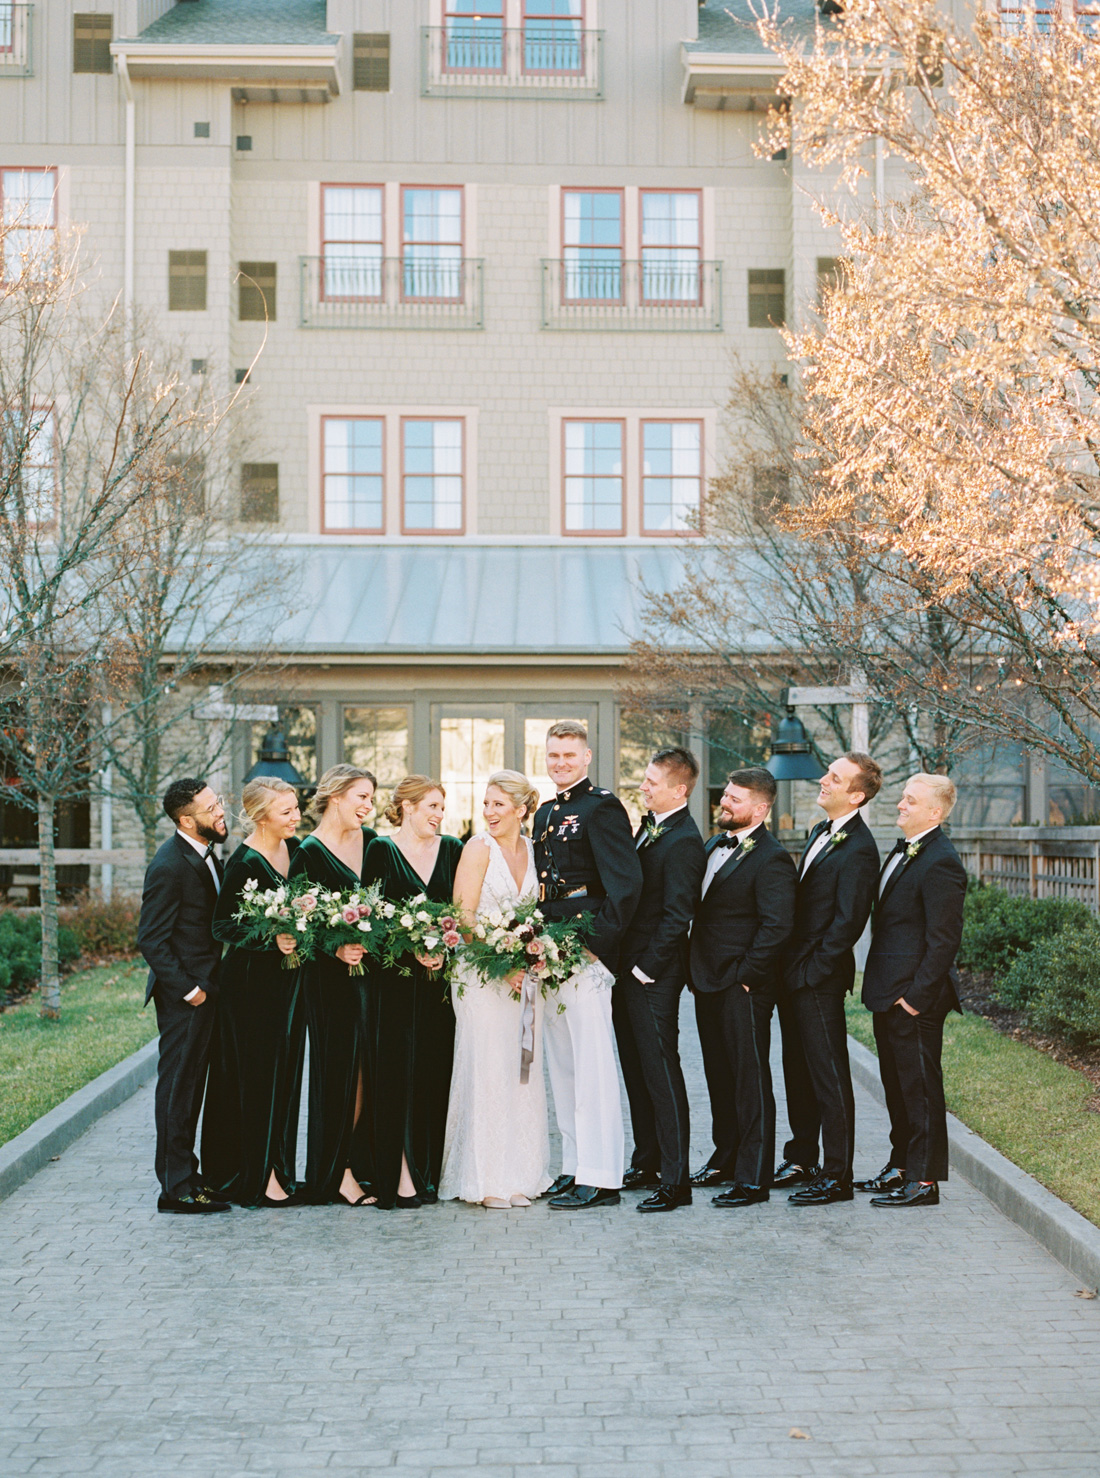 Michelle-whitley-photography-chesapeake-bay-beach-club-wedding